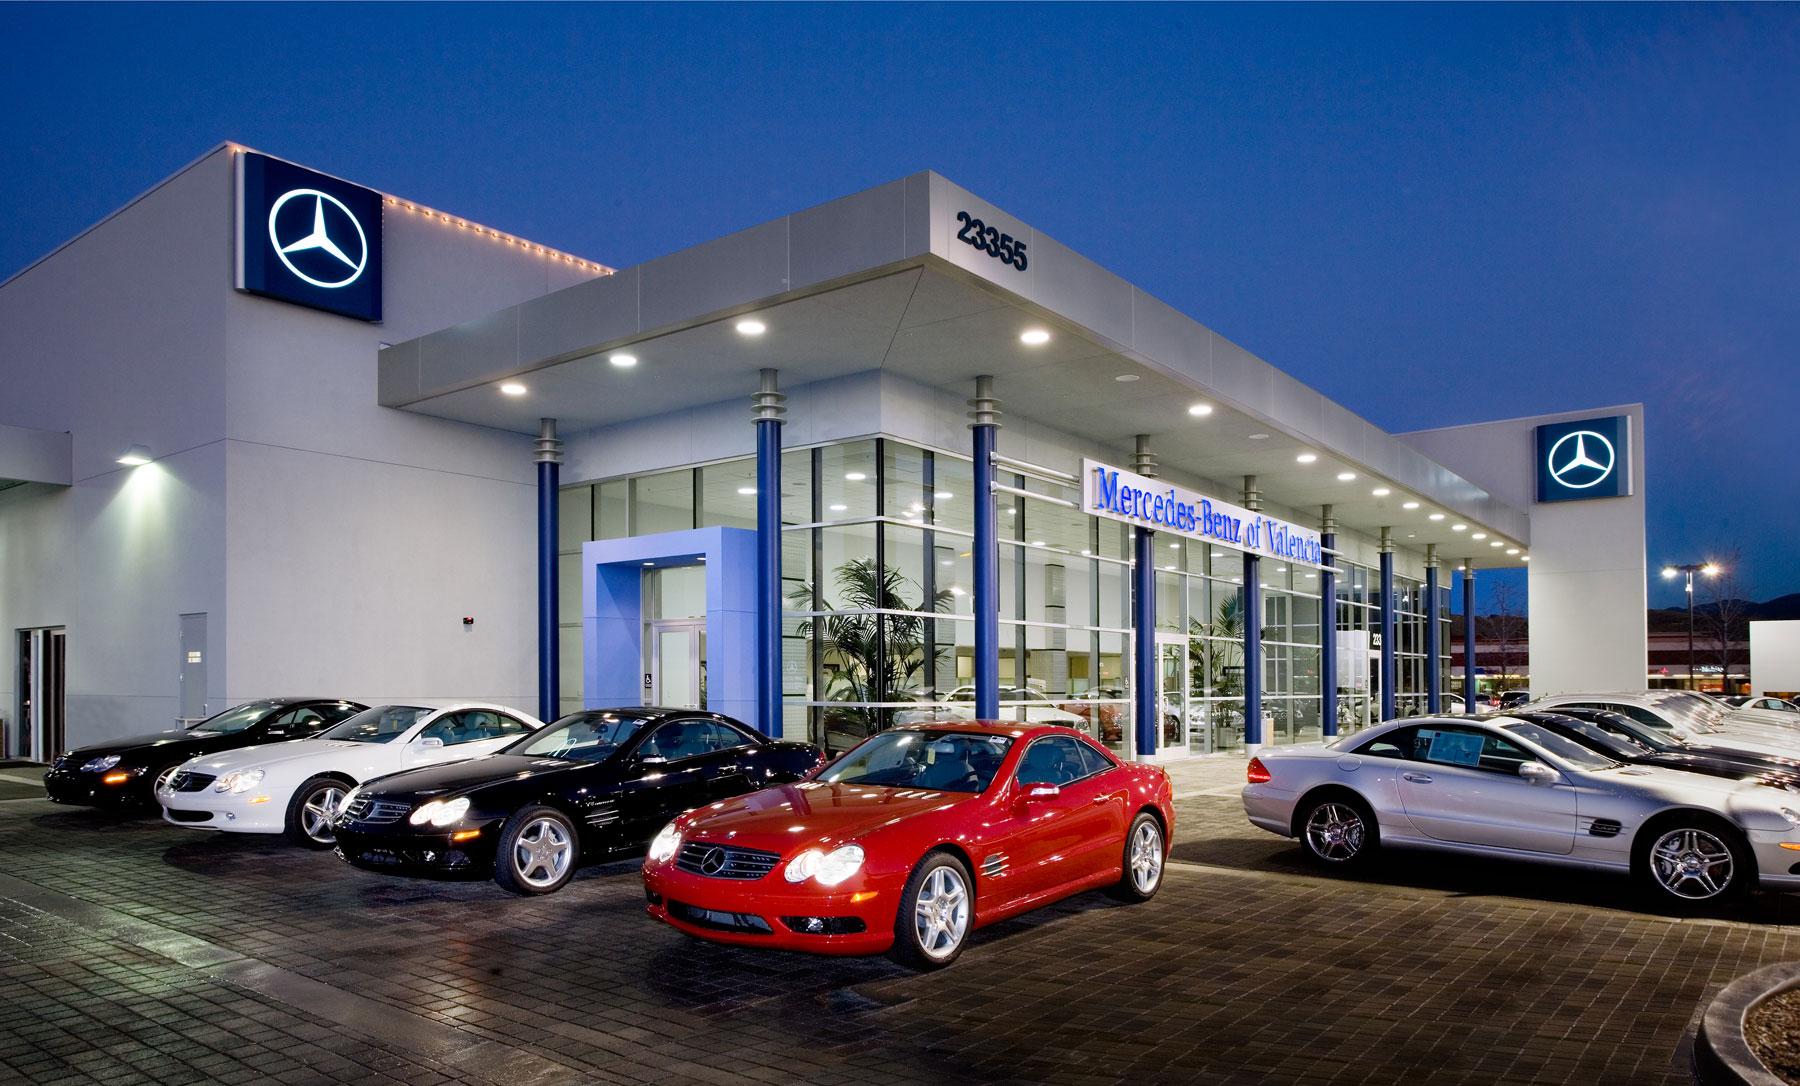 Mercedes-Benz of Valencia - Snyder Langston